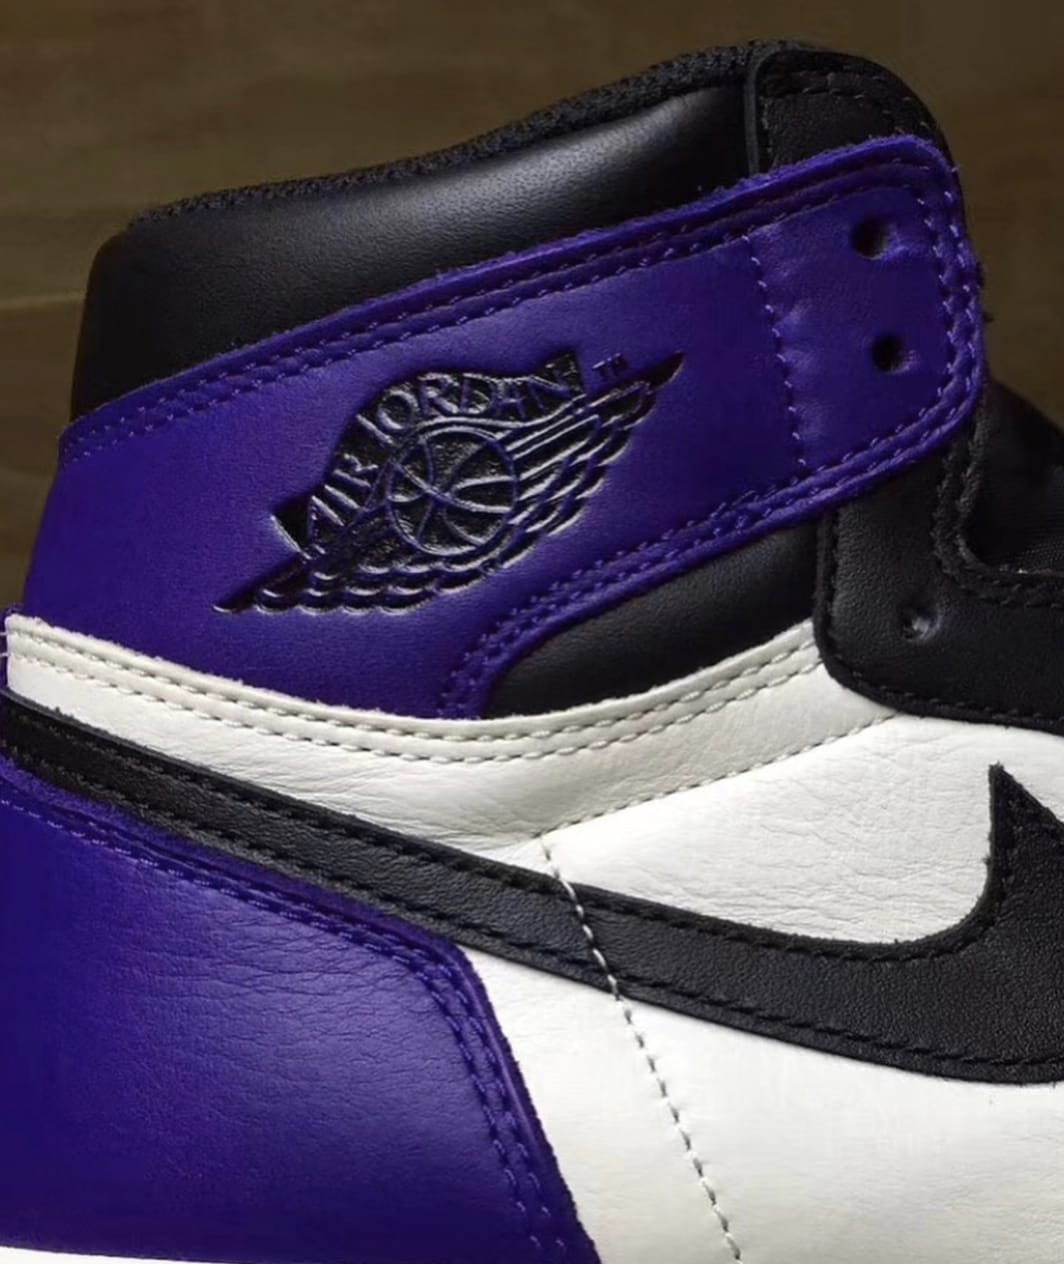 Air Jordan 1 'Court Purple' 4